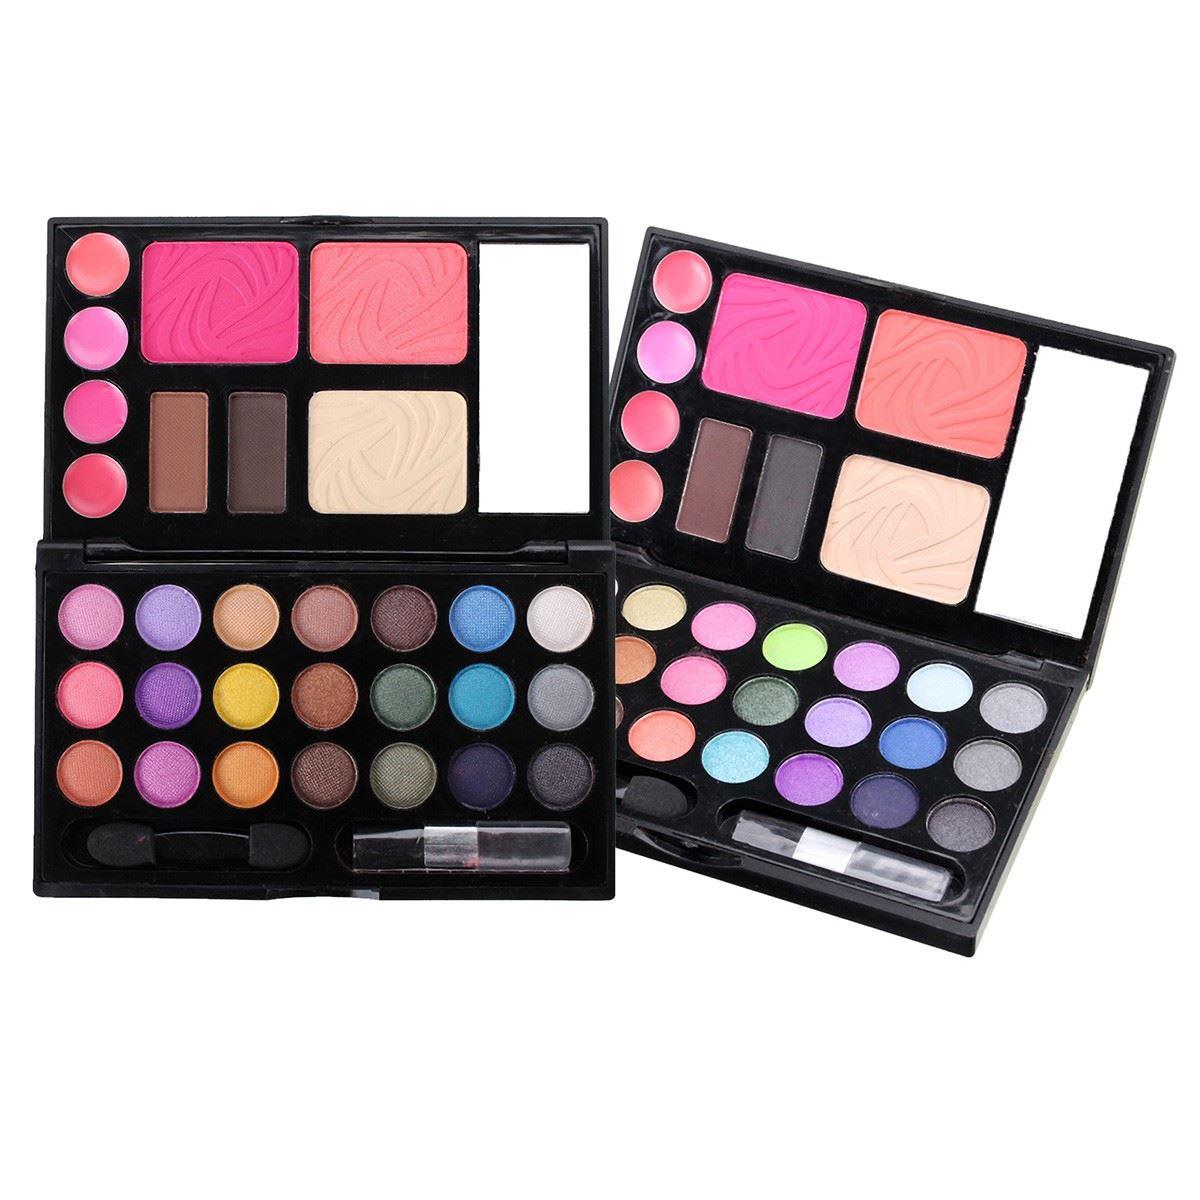 Rich 21 Color Eyeshadow Palette Lip Gloss Eyebrow Cream Foundation Powder Blusher Set Makeup Cosmetic Box Kit New Fashion(China (Mainland))